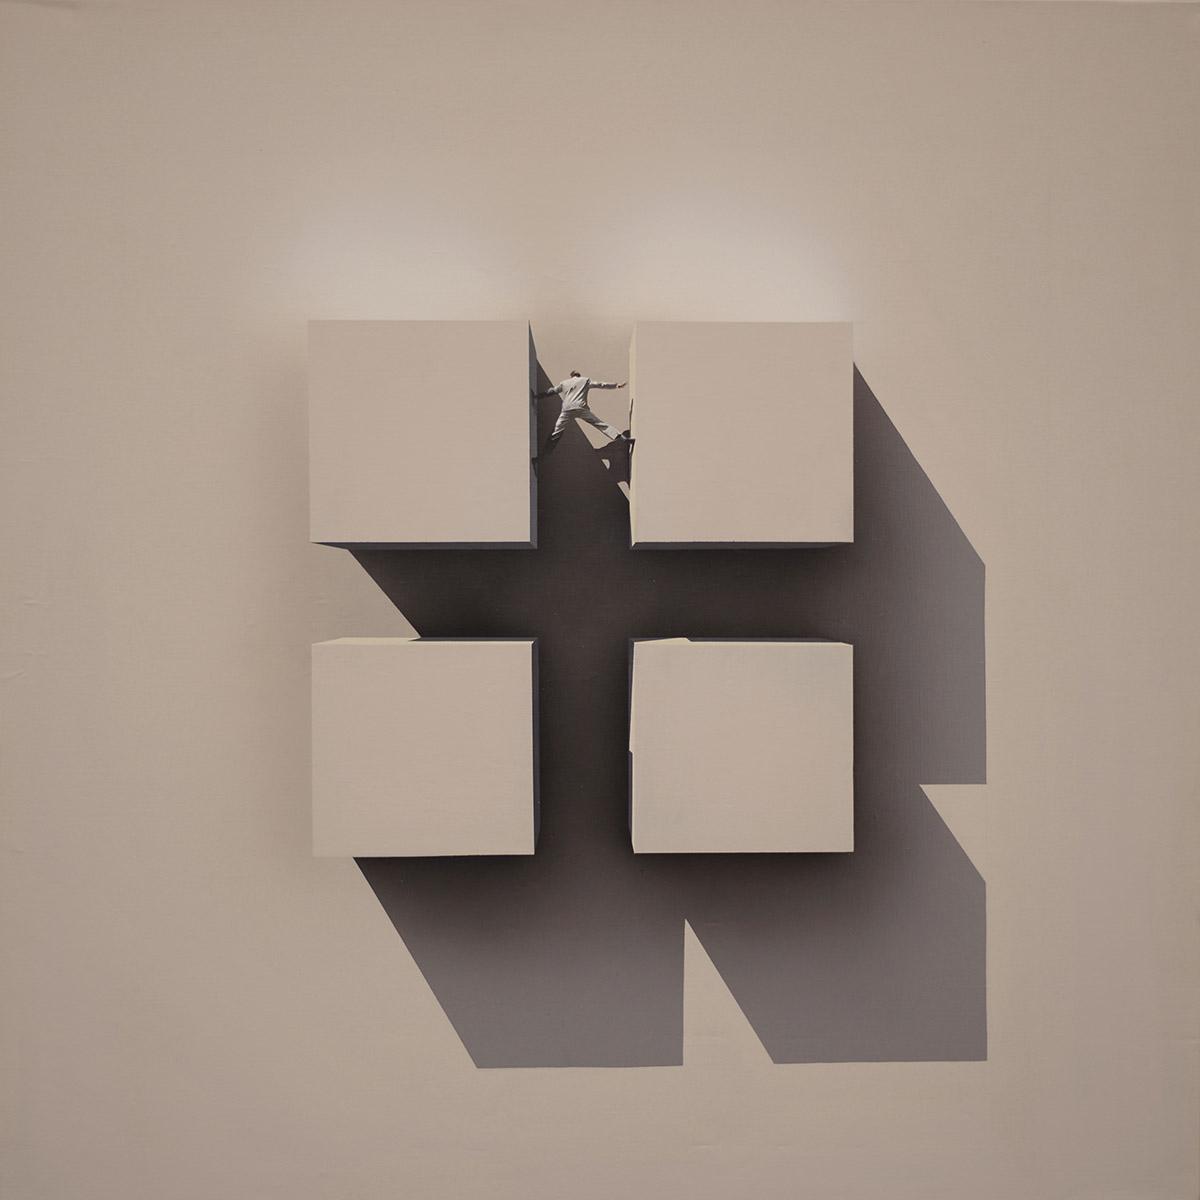 "<a href=""https://howardgriffinprints.com/artists/mehdi-ghadyanloo"">Mehdi Ghadyanloo</a> / <a href=""https://howardgriffinprints.com/print/mehdi-ghadyanloo/zero-time/""><em>Zero Time</em></a>"